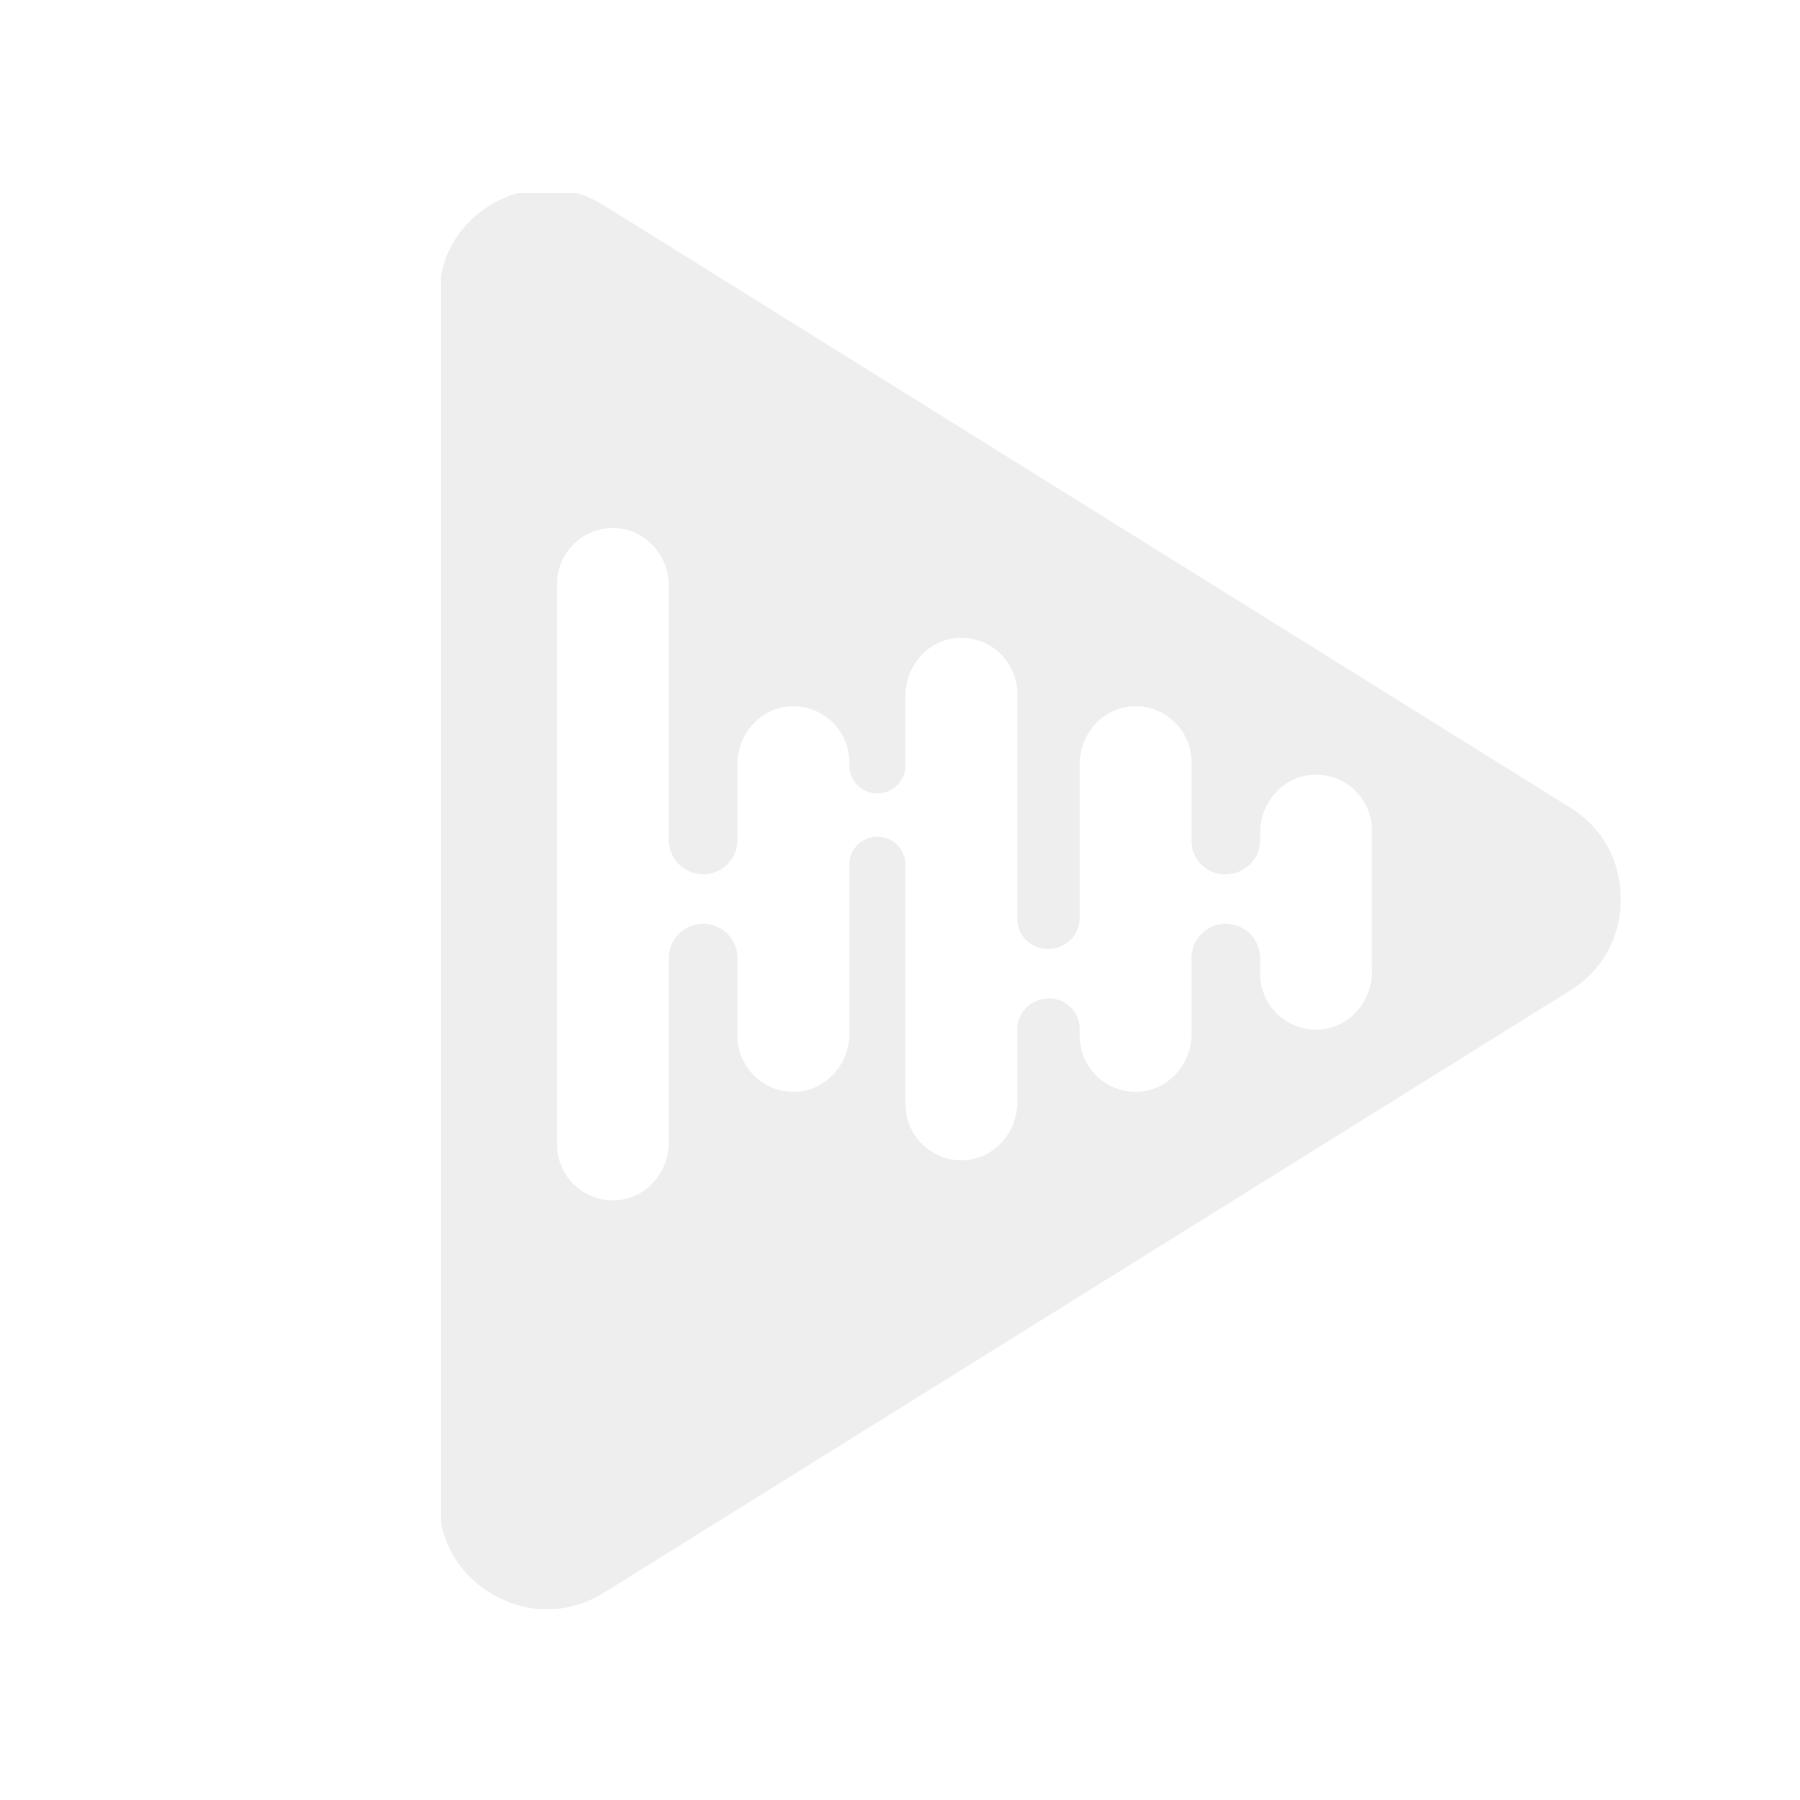 Grandview 148615 - Lerret Cyber, 16:9, 221x125, Manuelt 100